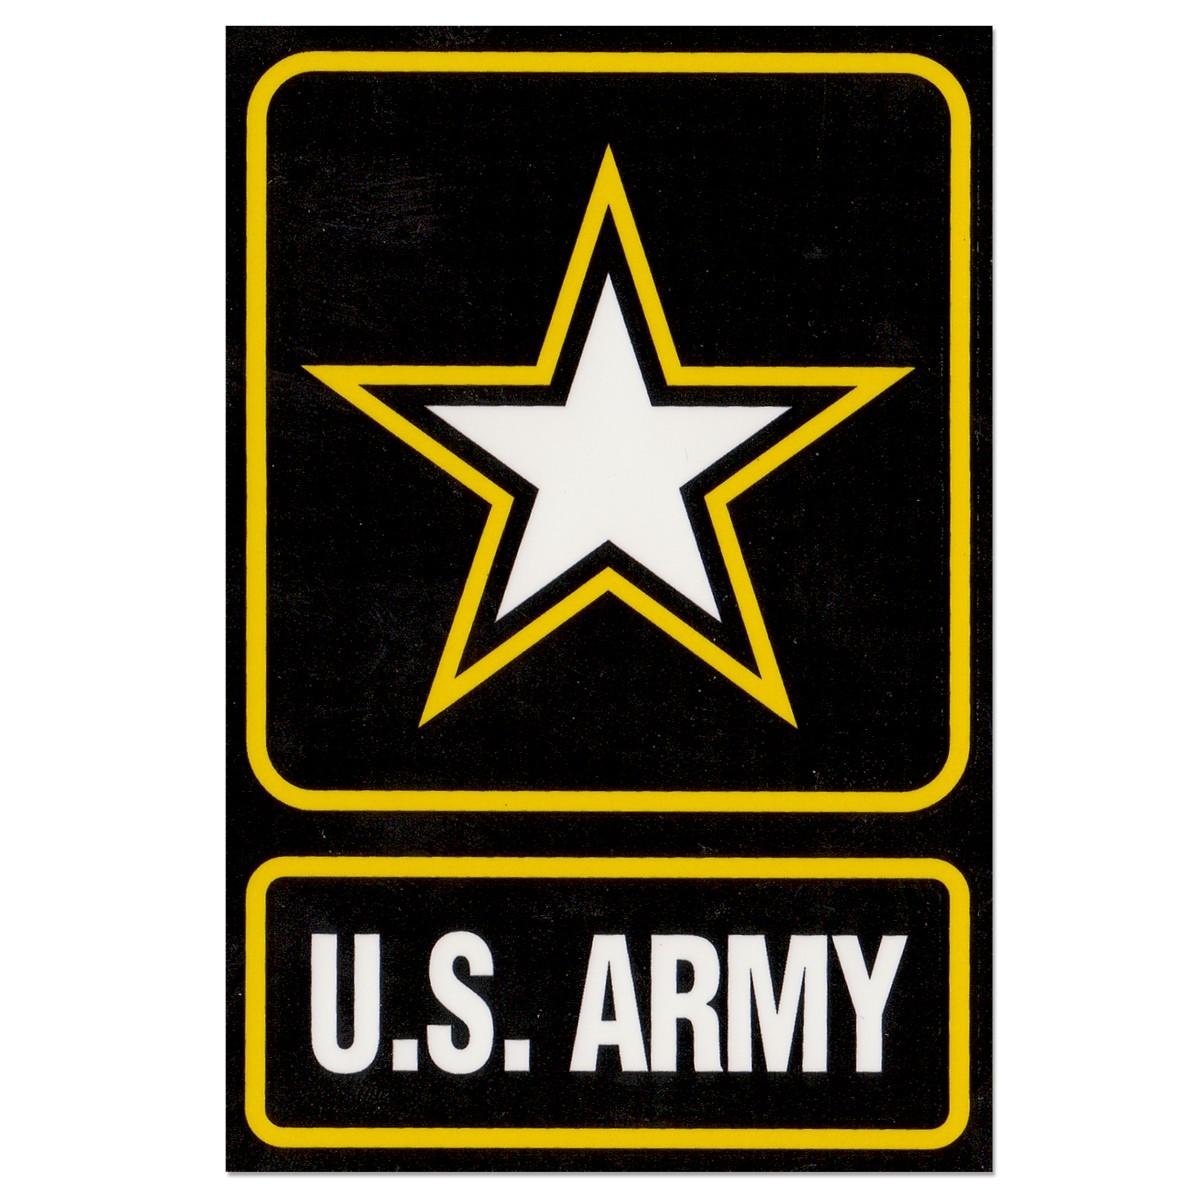 military clip art army - photo #45